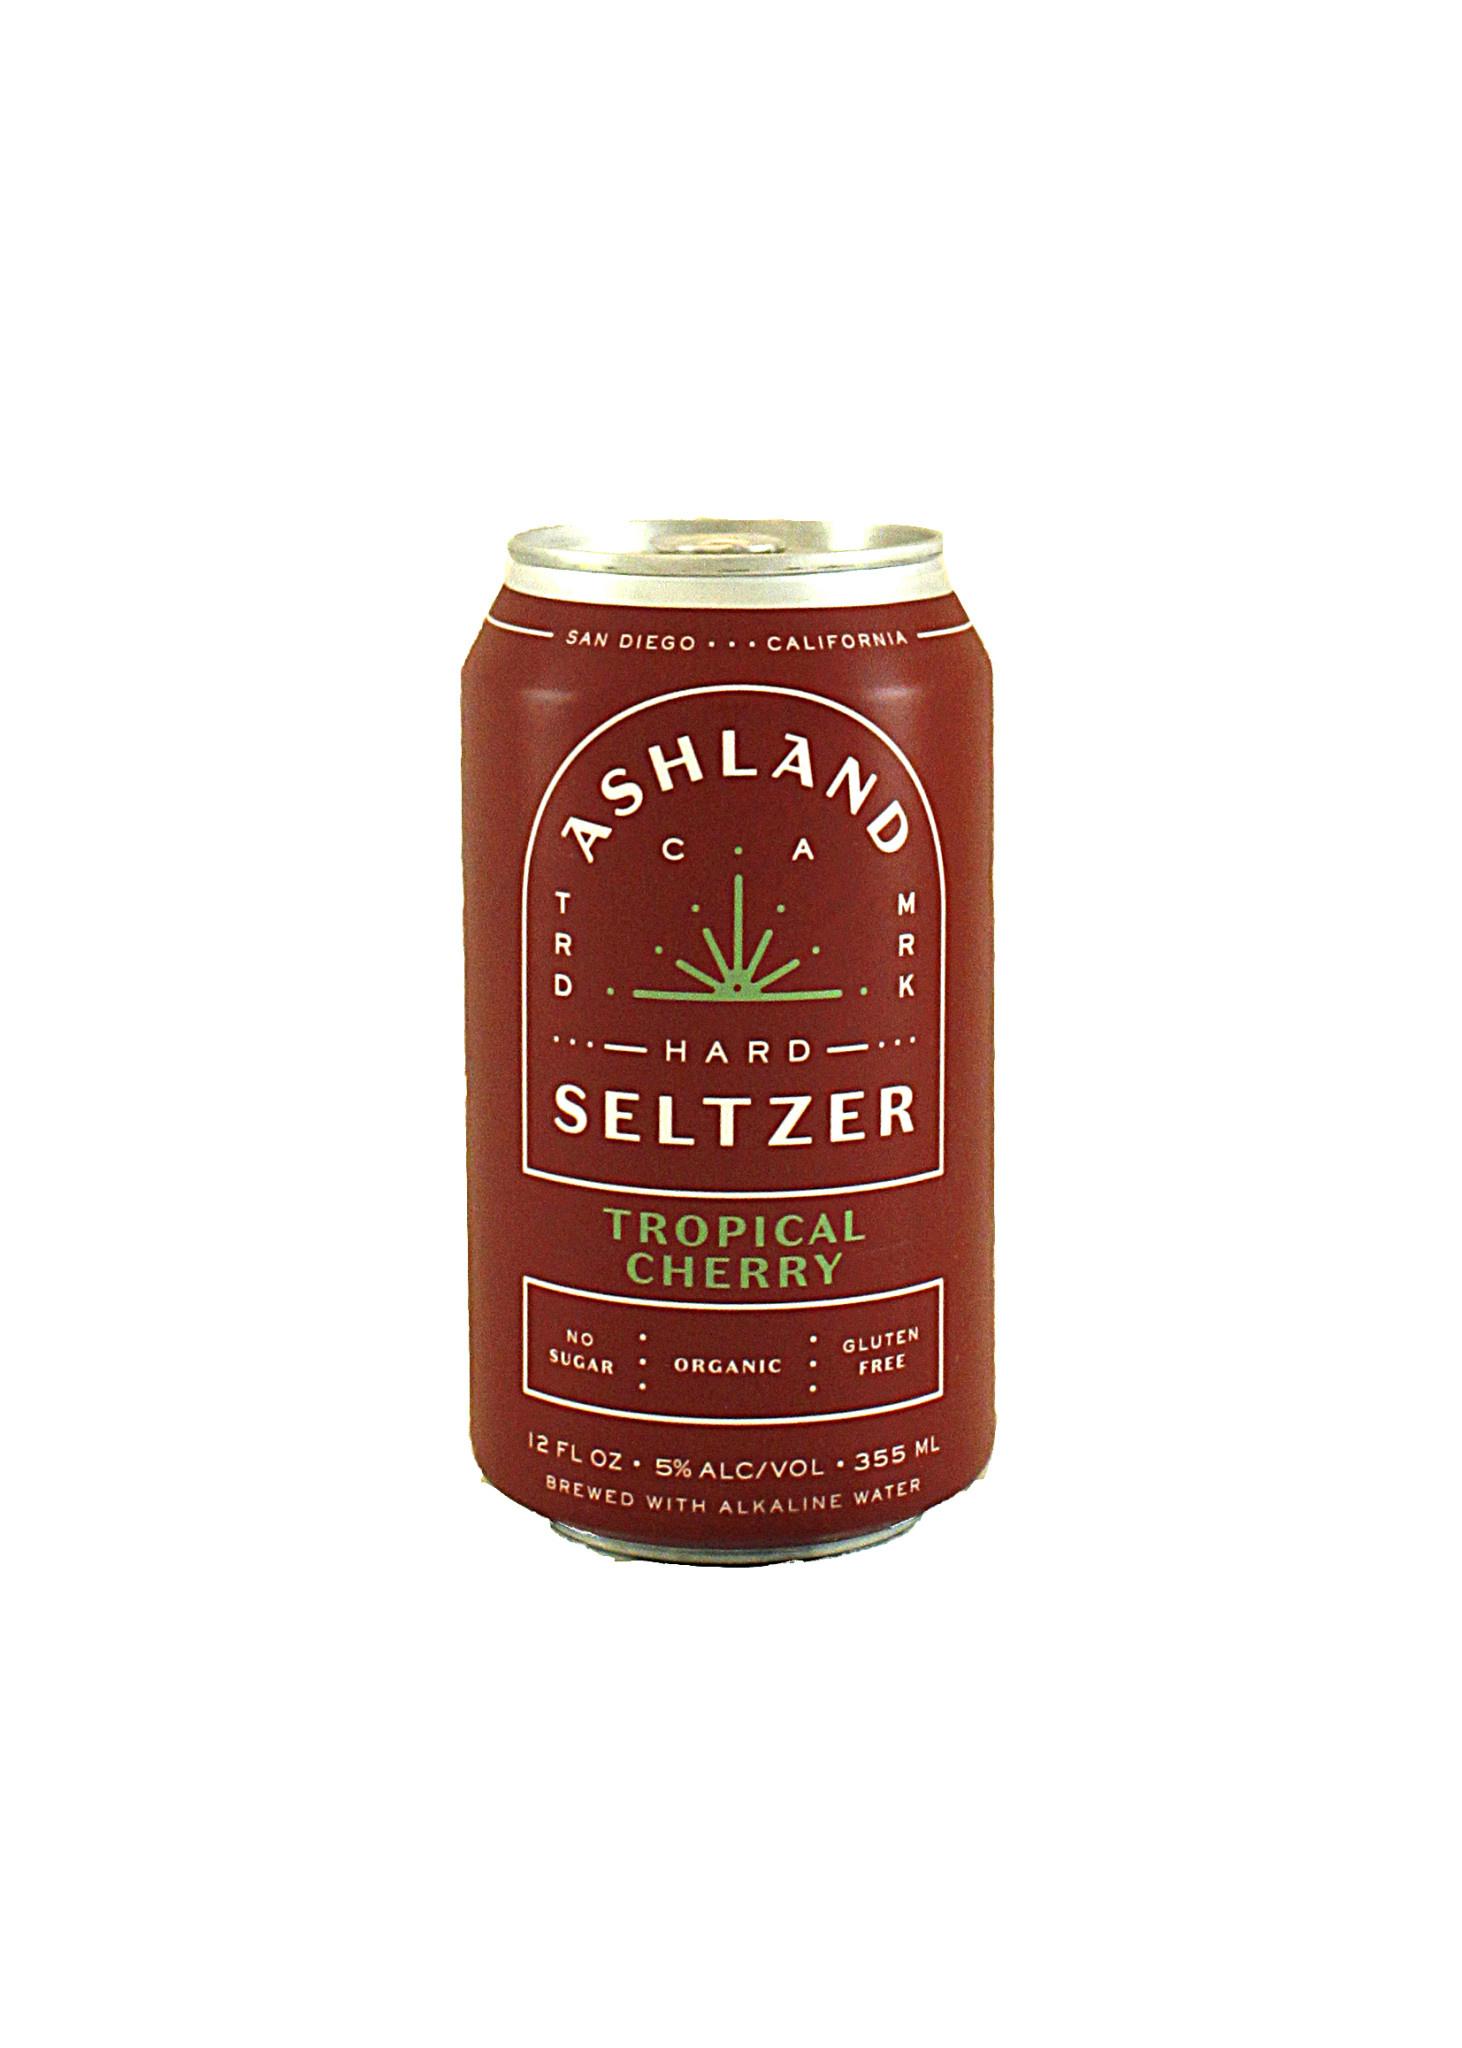 Ashland Hard Seltzer Tropical Cherry, Organic 12oz. Can